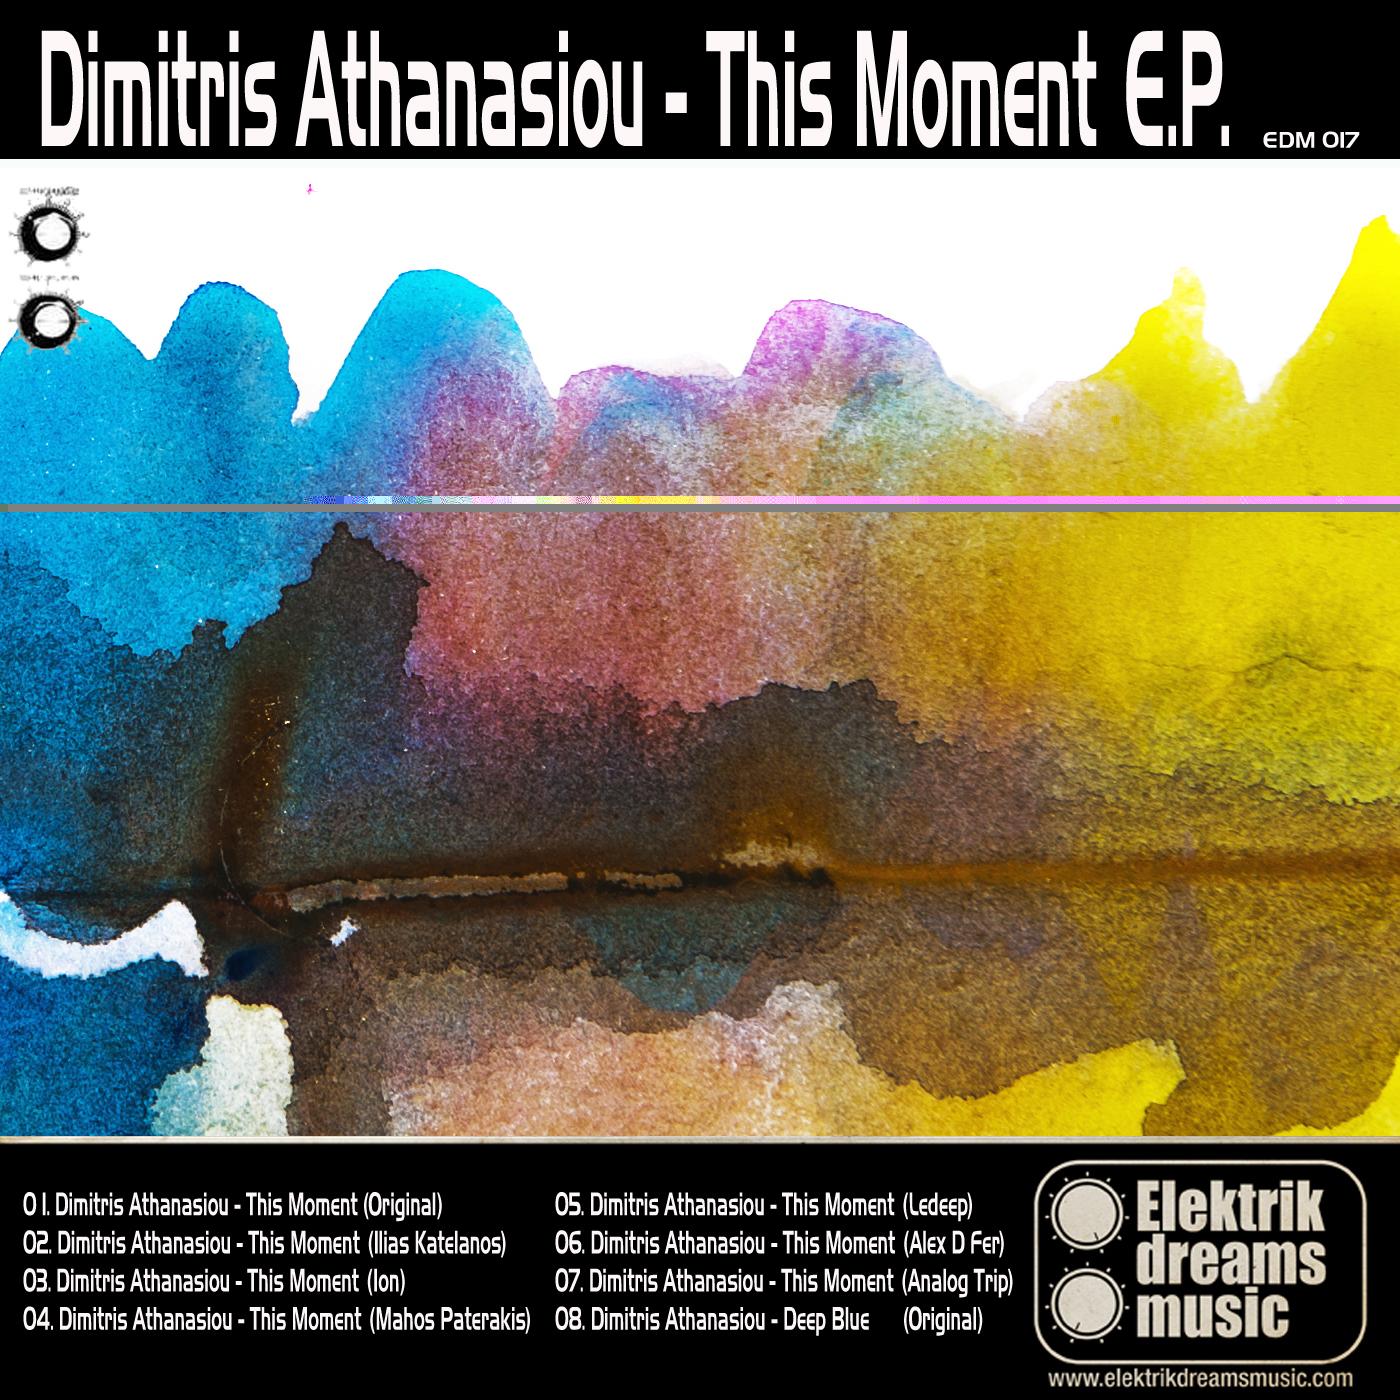 Dimitris Athanasiou - This Moment (Ion Remix)